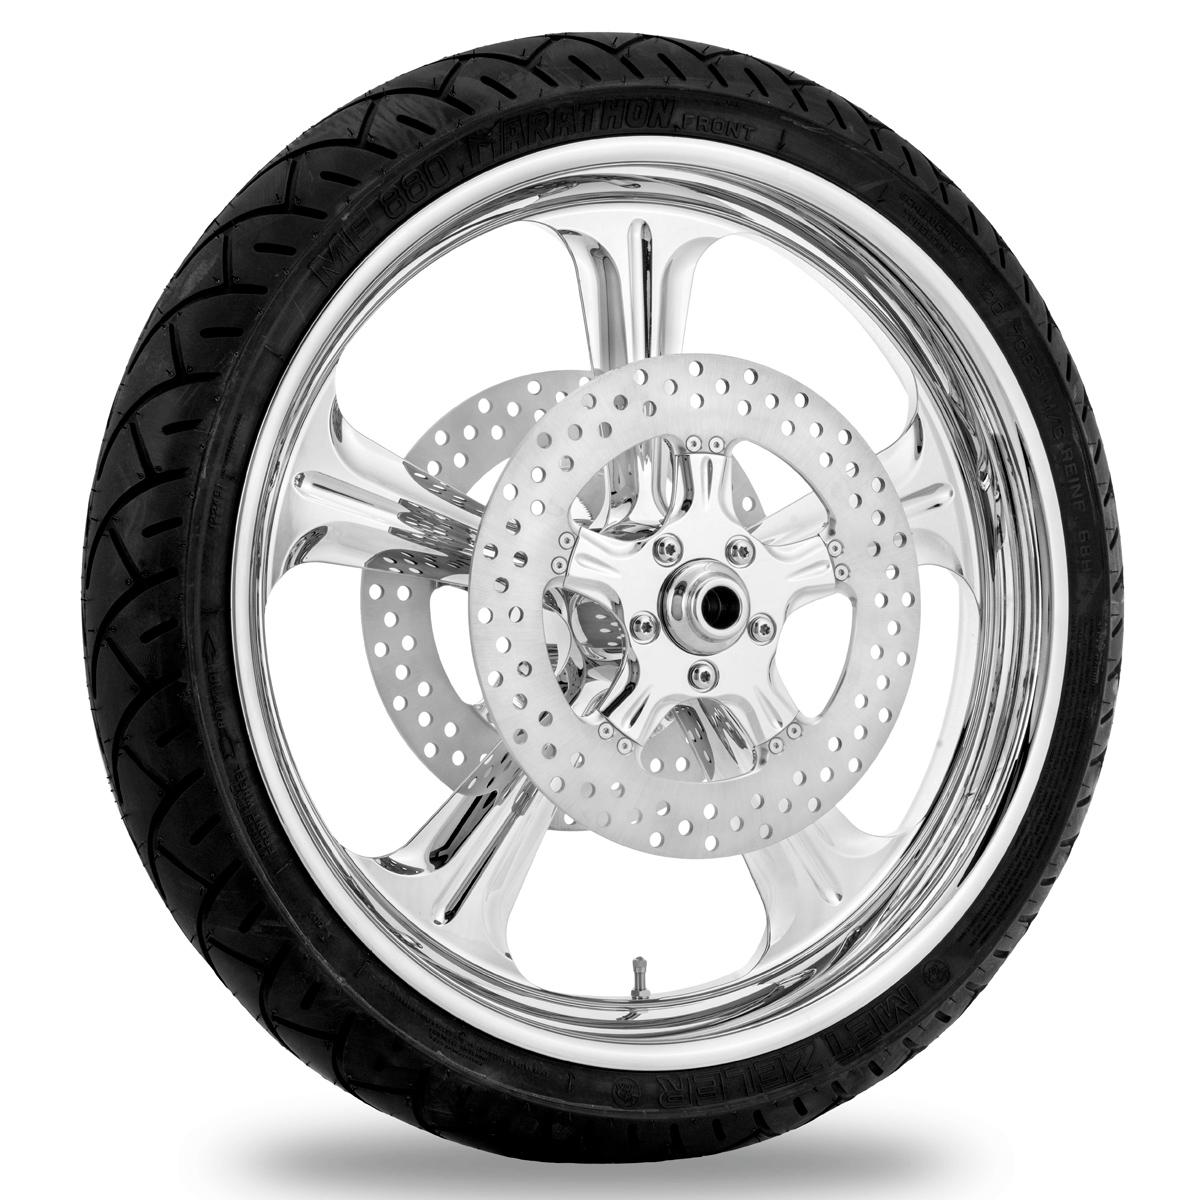 Performance Machine Wrath Chrome Front Wheel 21x2.15 ABS